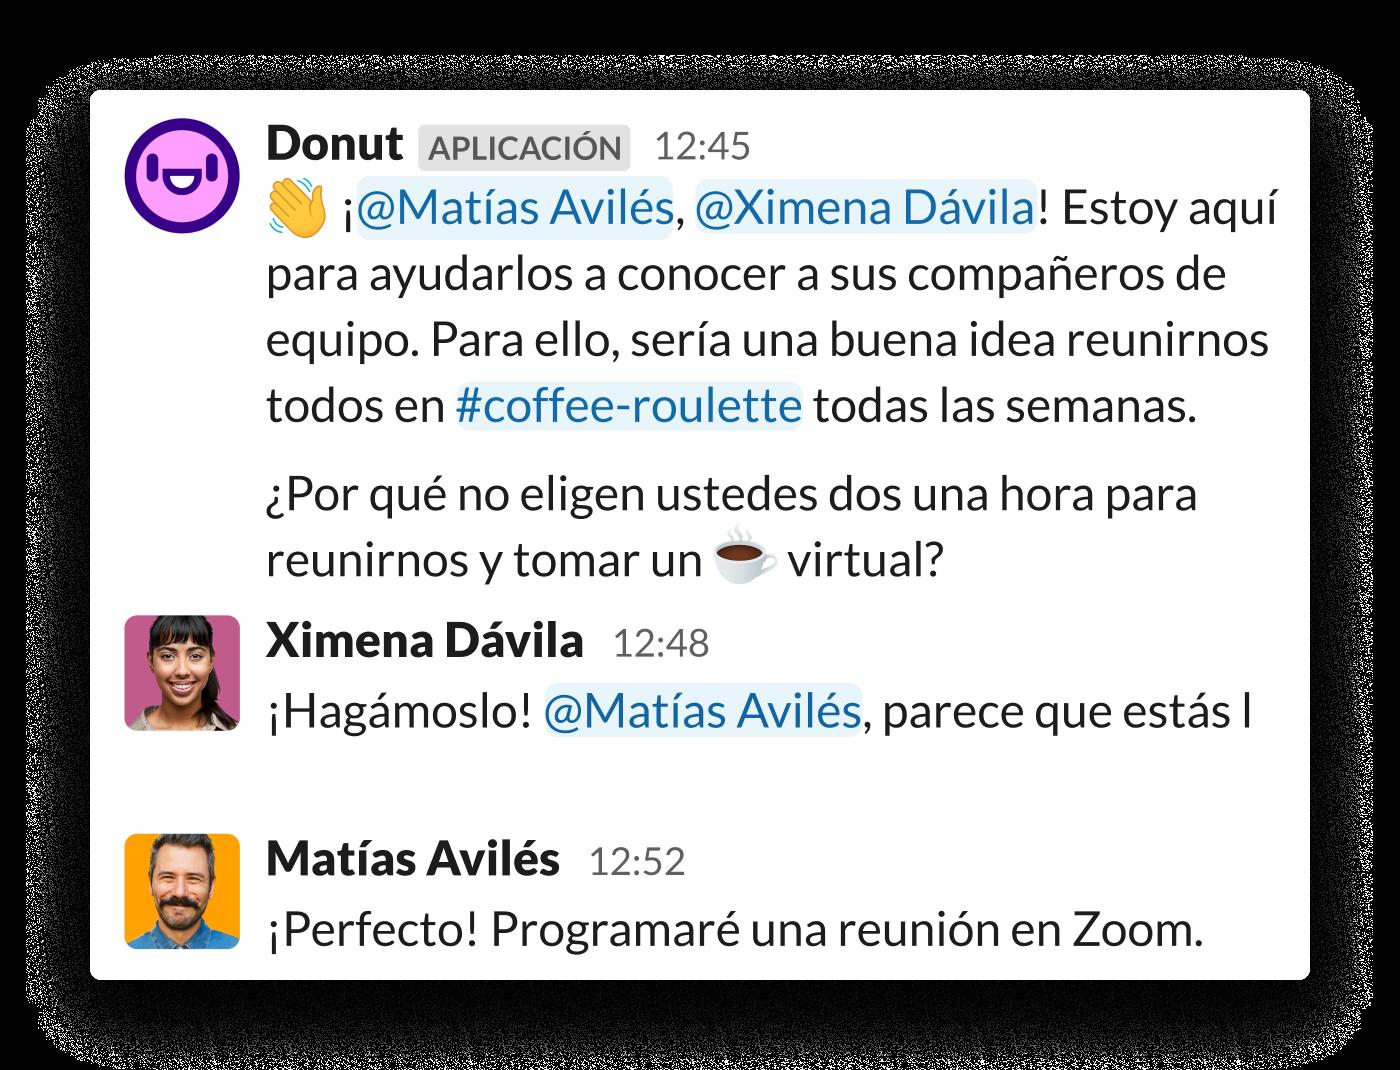 Se les pide a dos colegas que se reúnan a través de la aplicación Donut para Slack